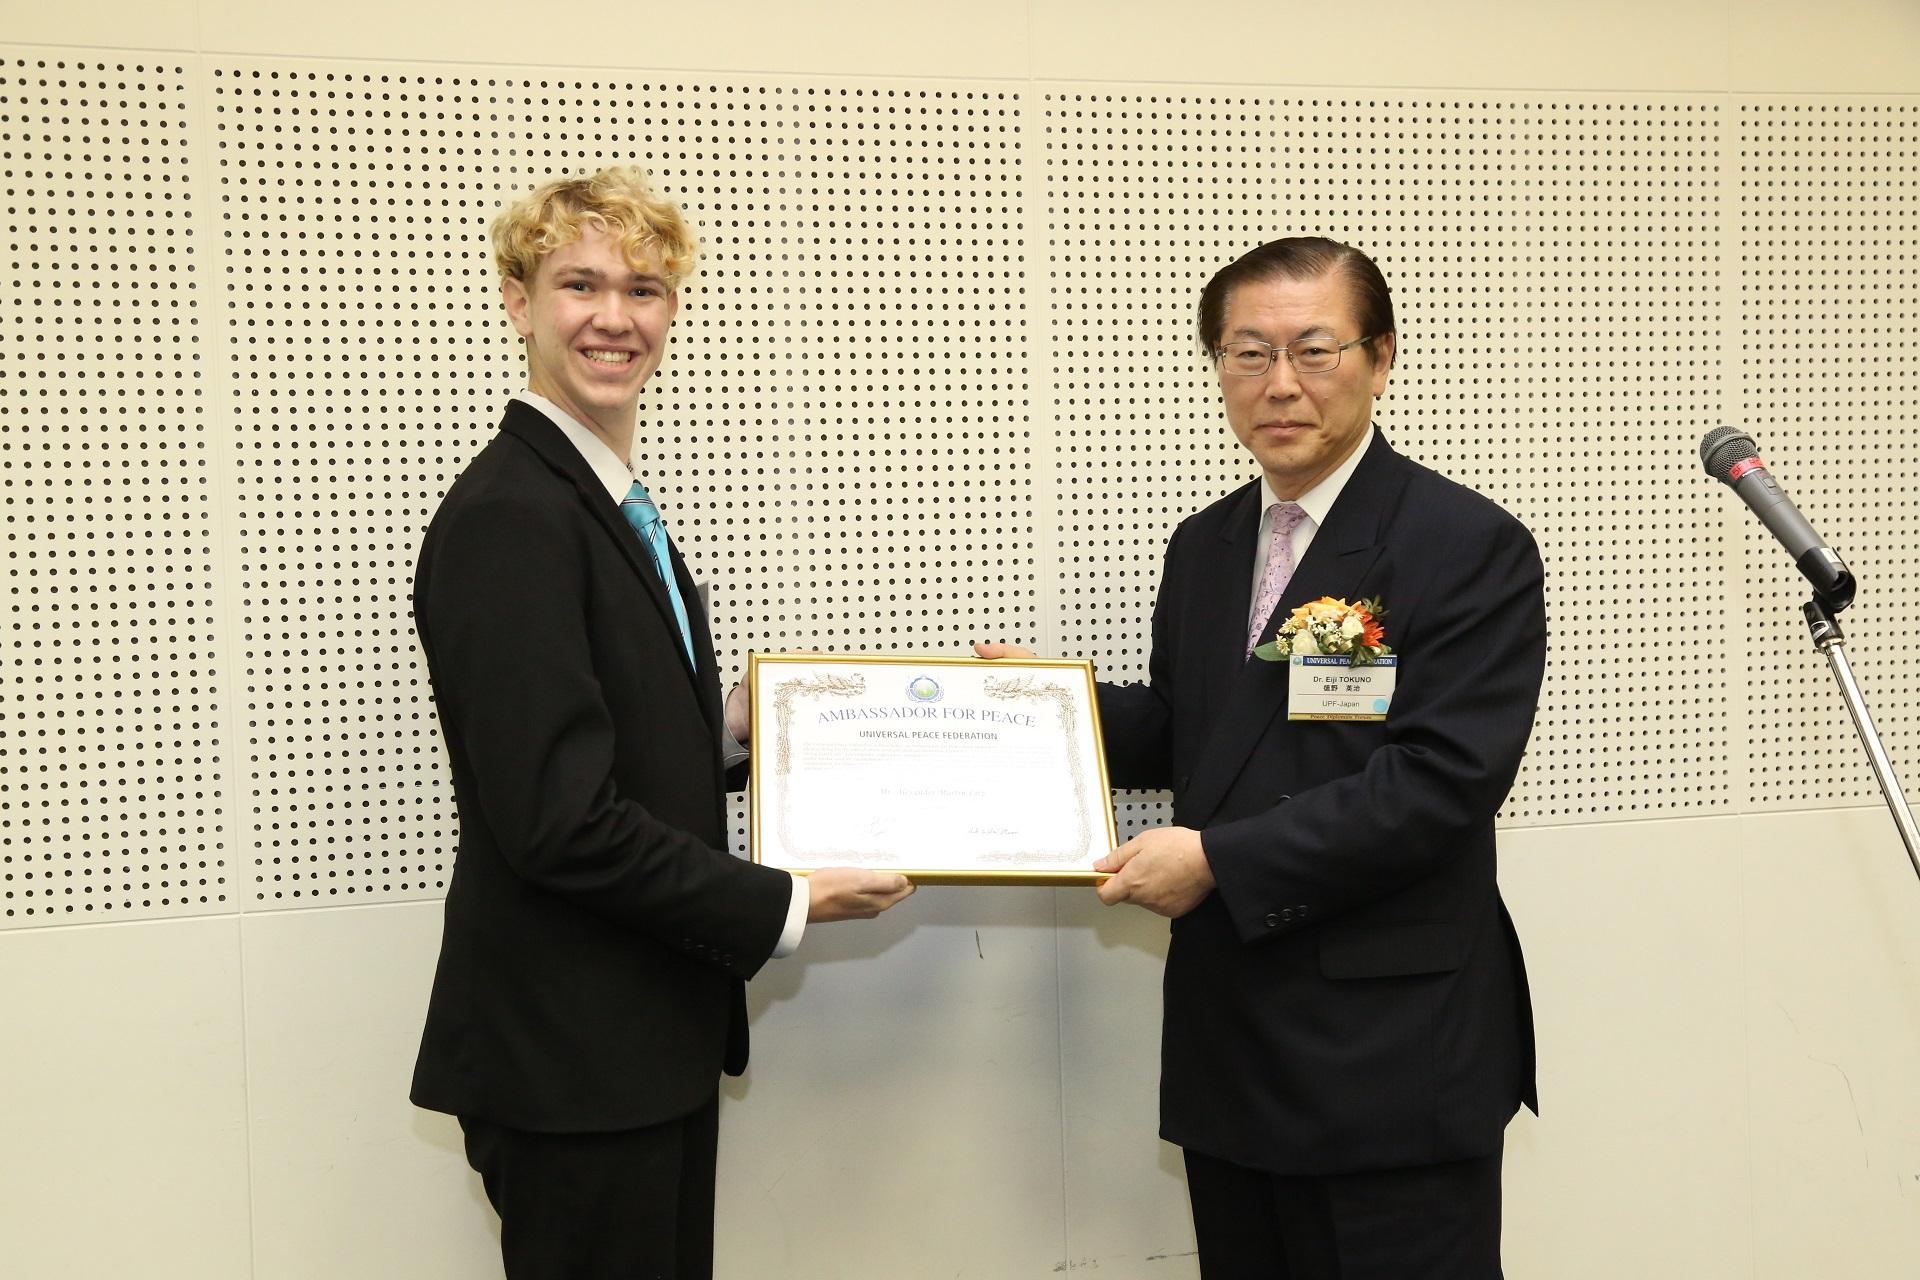 Alex receiving the Universal Peace Ambassador Award